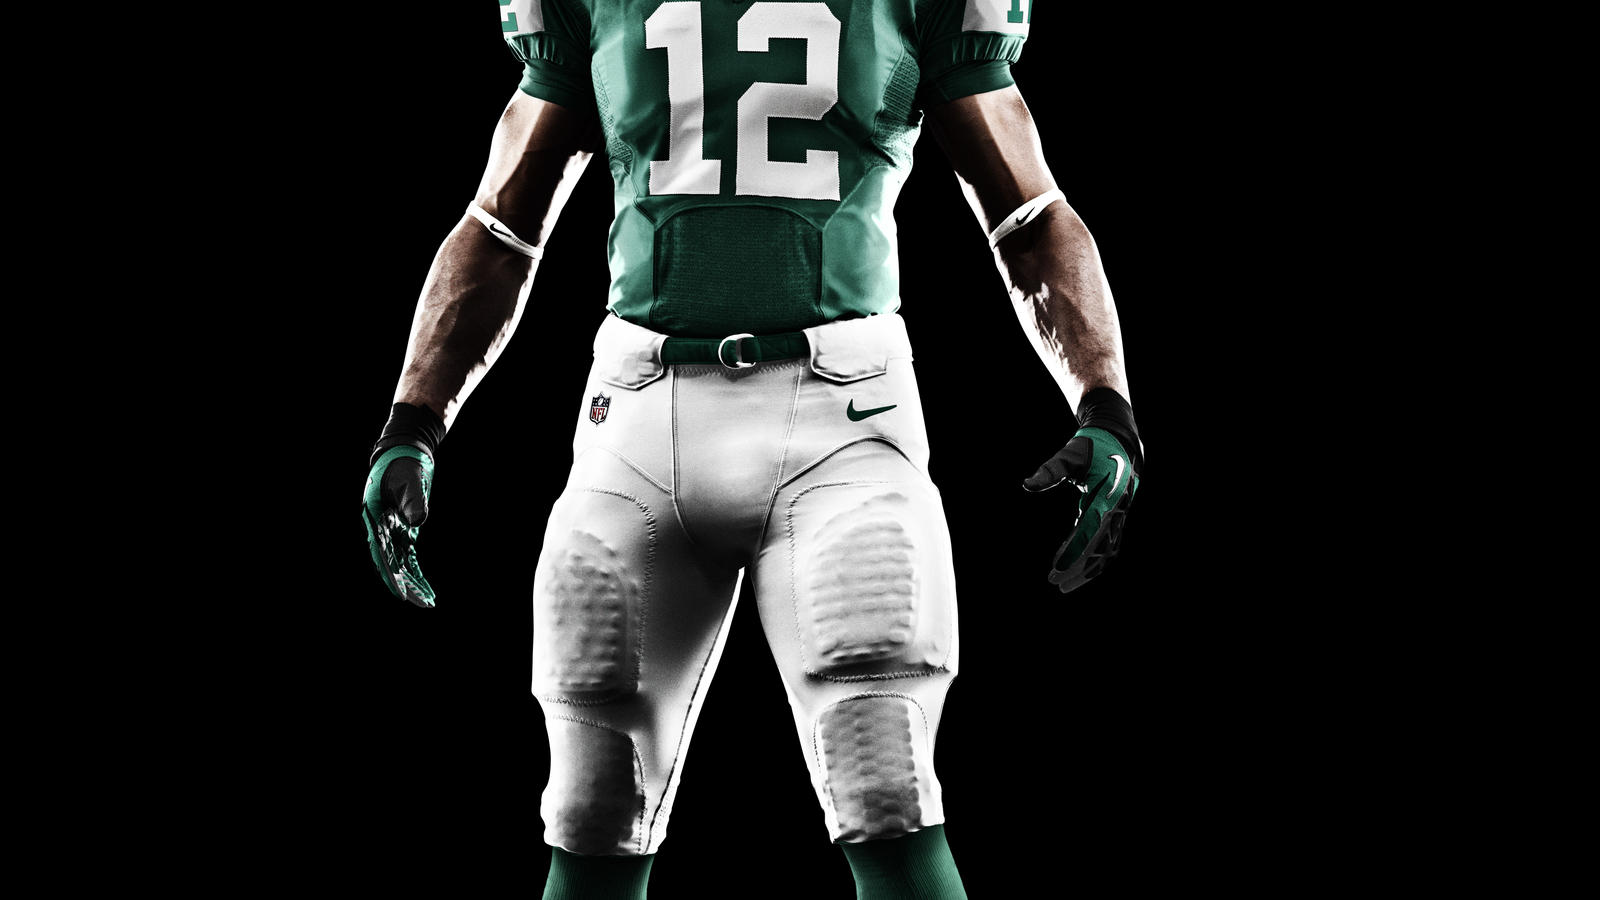 jets football jersey